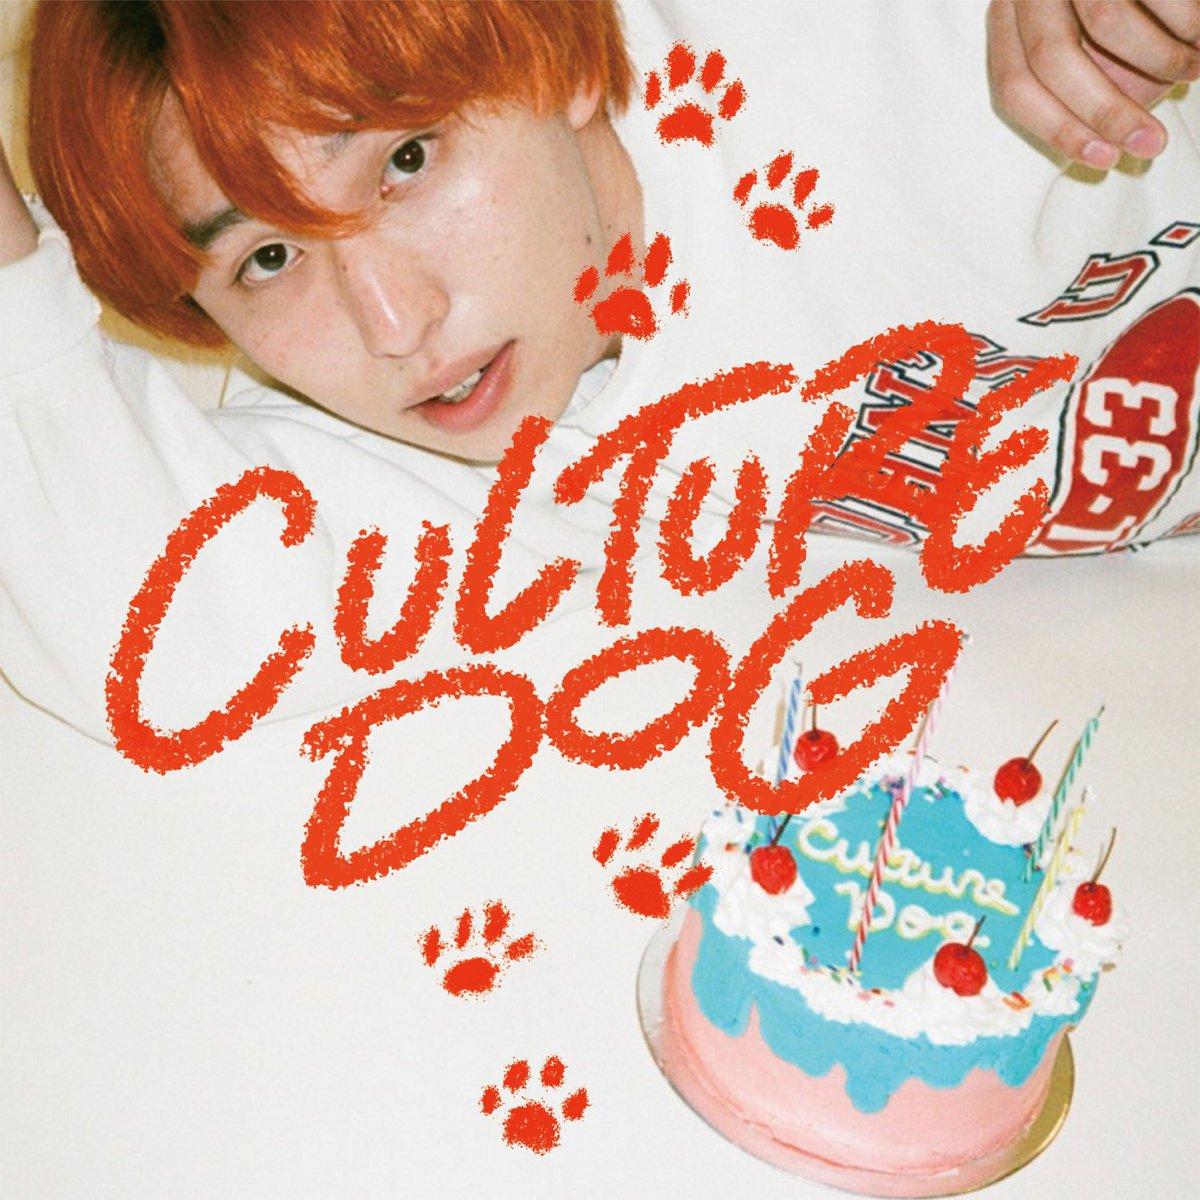 『Mega Shinnosuke - 反好青年』収録の『CULTURE DOG』ジャケット